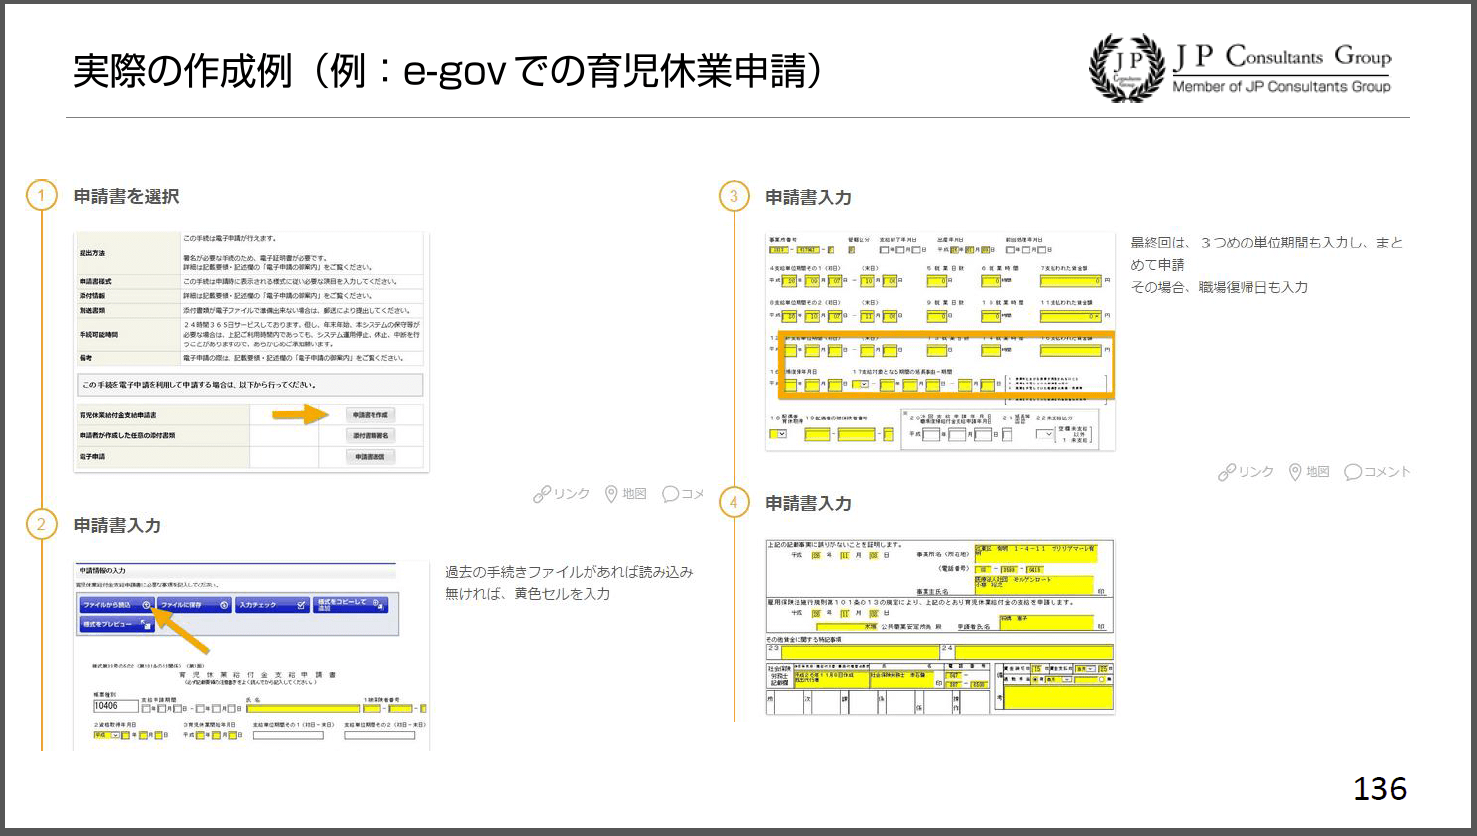 20141202-000310